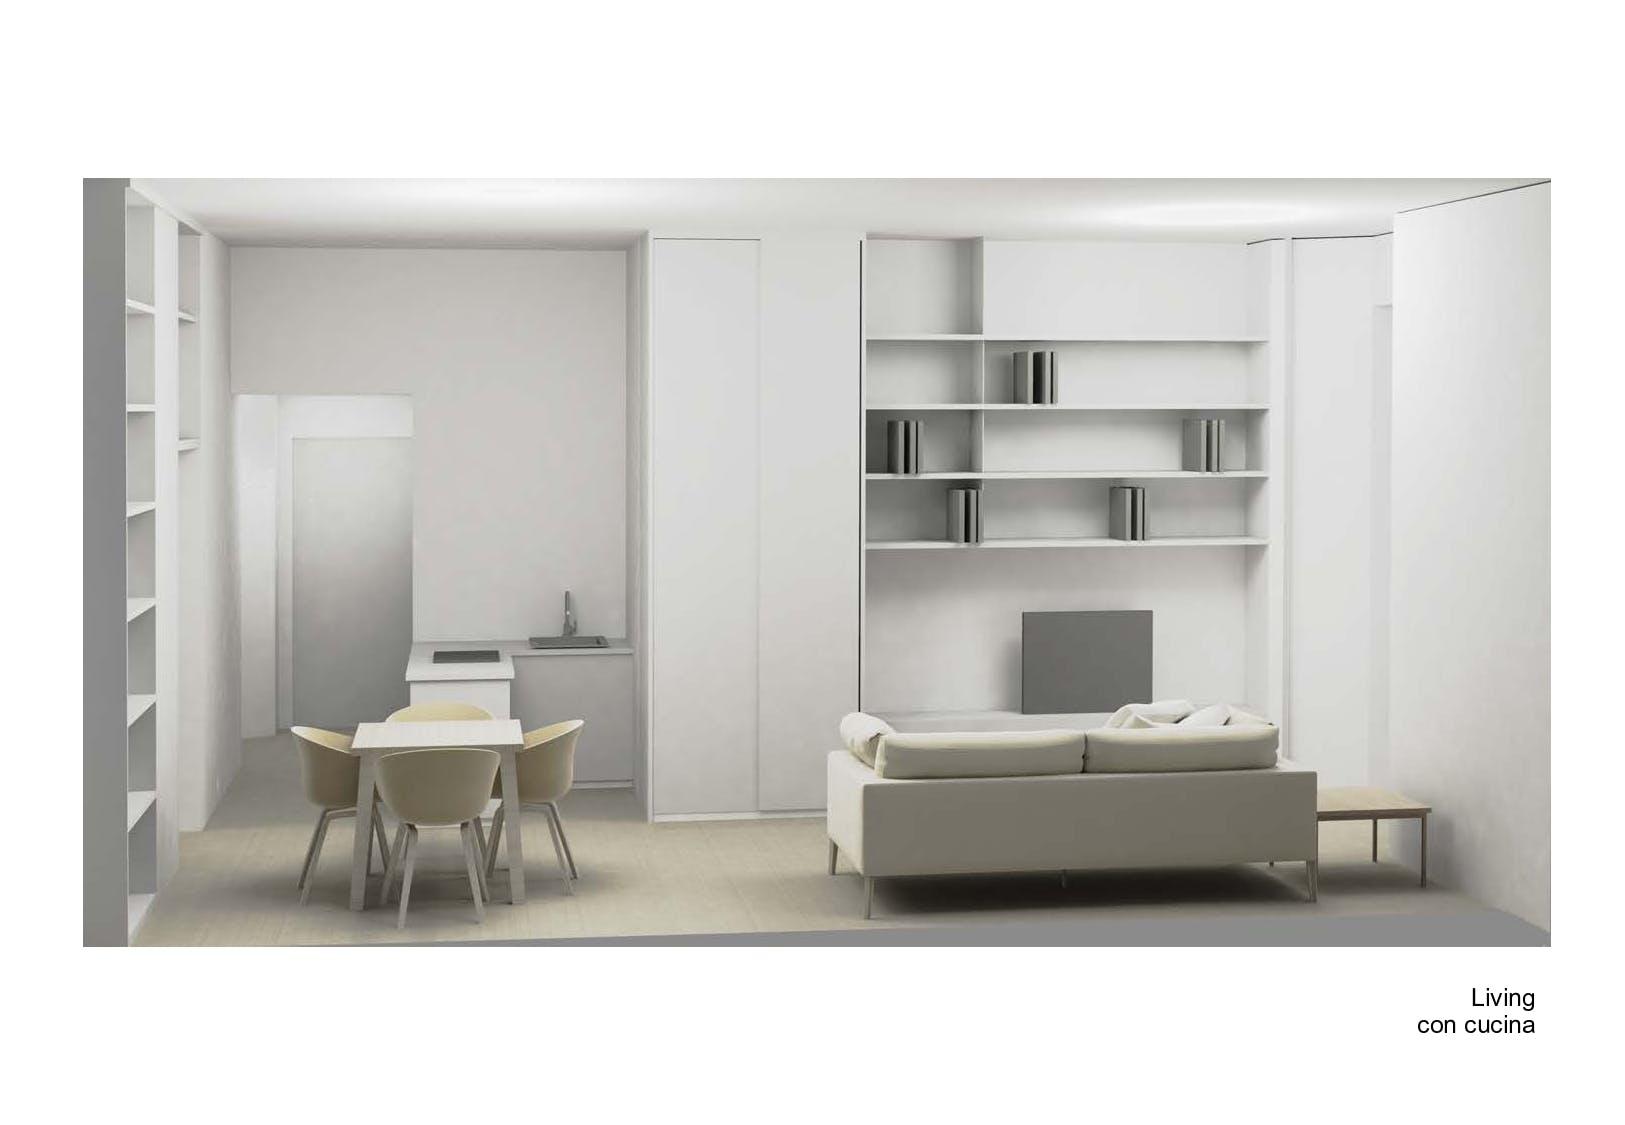 One-bedroom Apartment of 55m² in Via Plinio 20